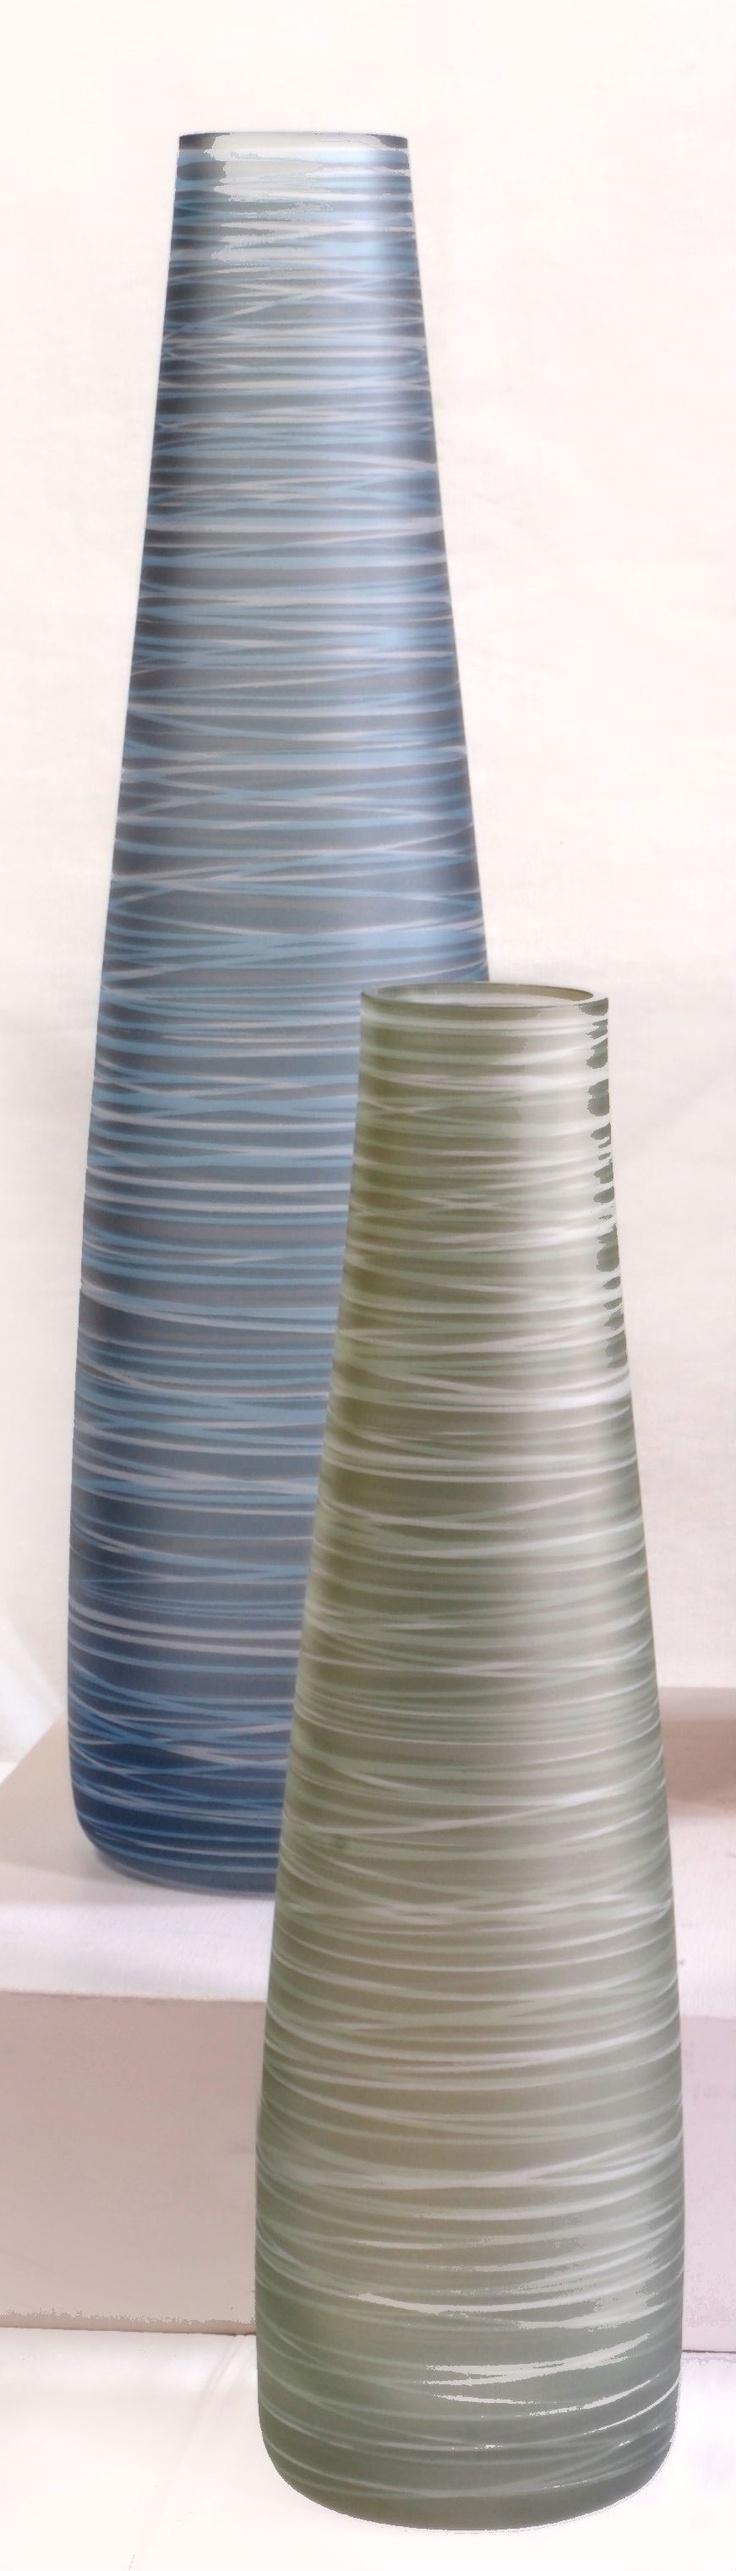 377 best gl images on Pinterest | Gl art, Crystals and Drinkware Ziploc Gl Vase on